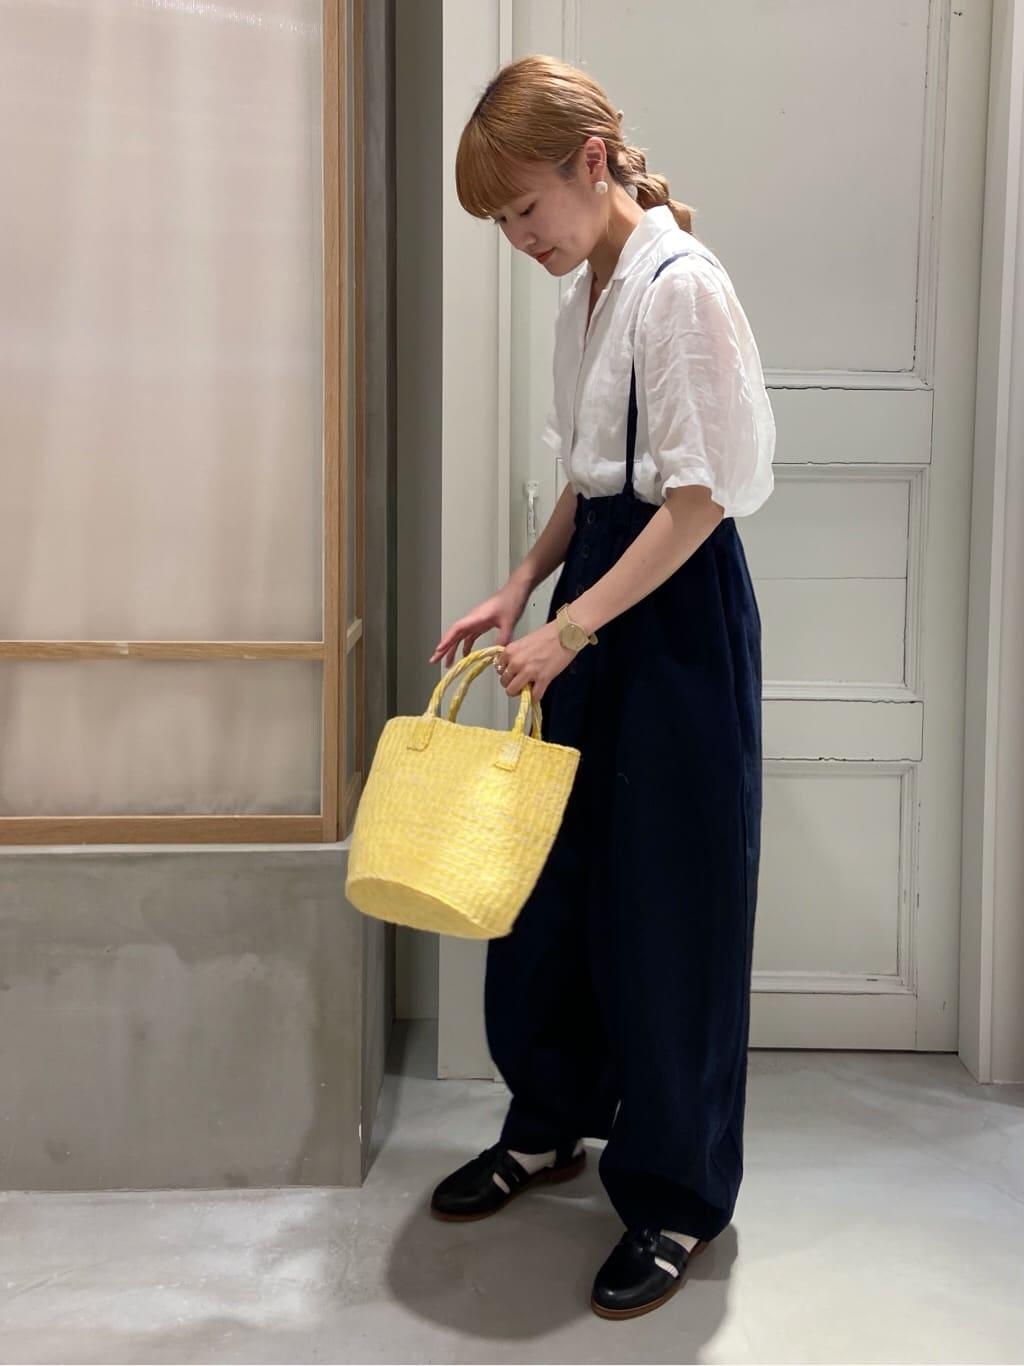 bulle de savon 渋谷スクランブルスクエア 身長:160cm 2021.06.22